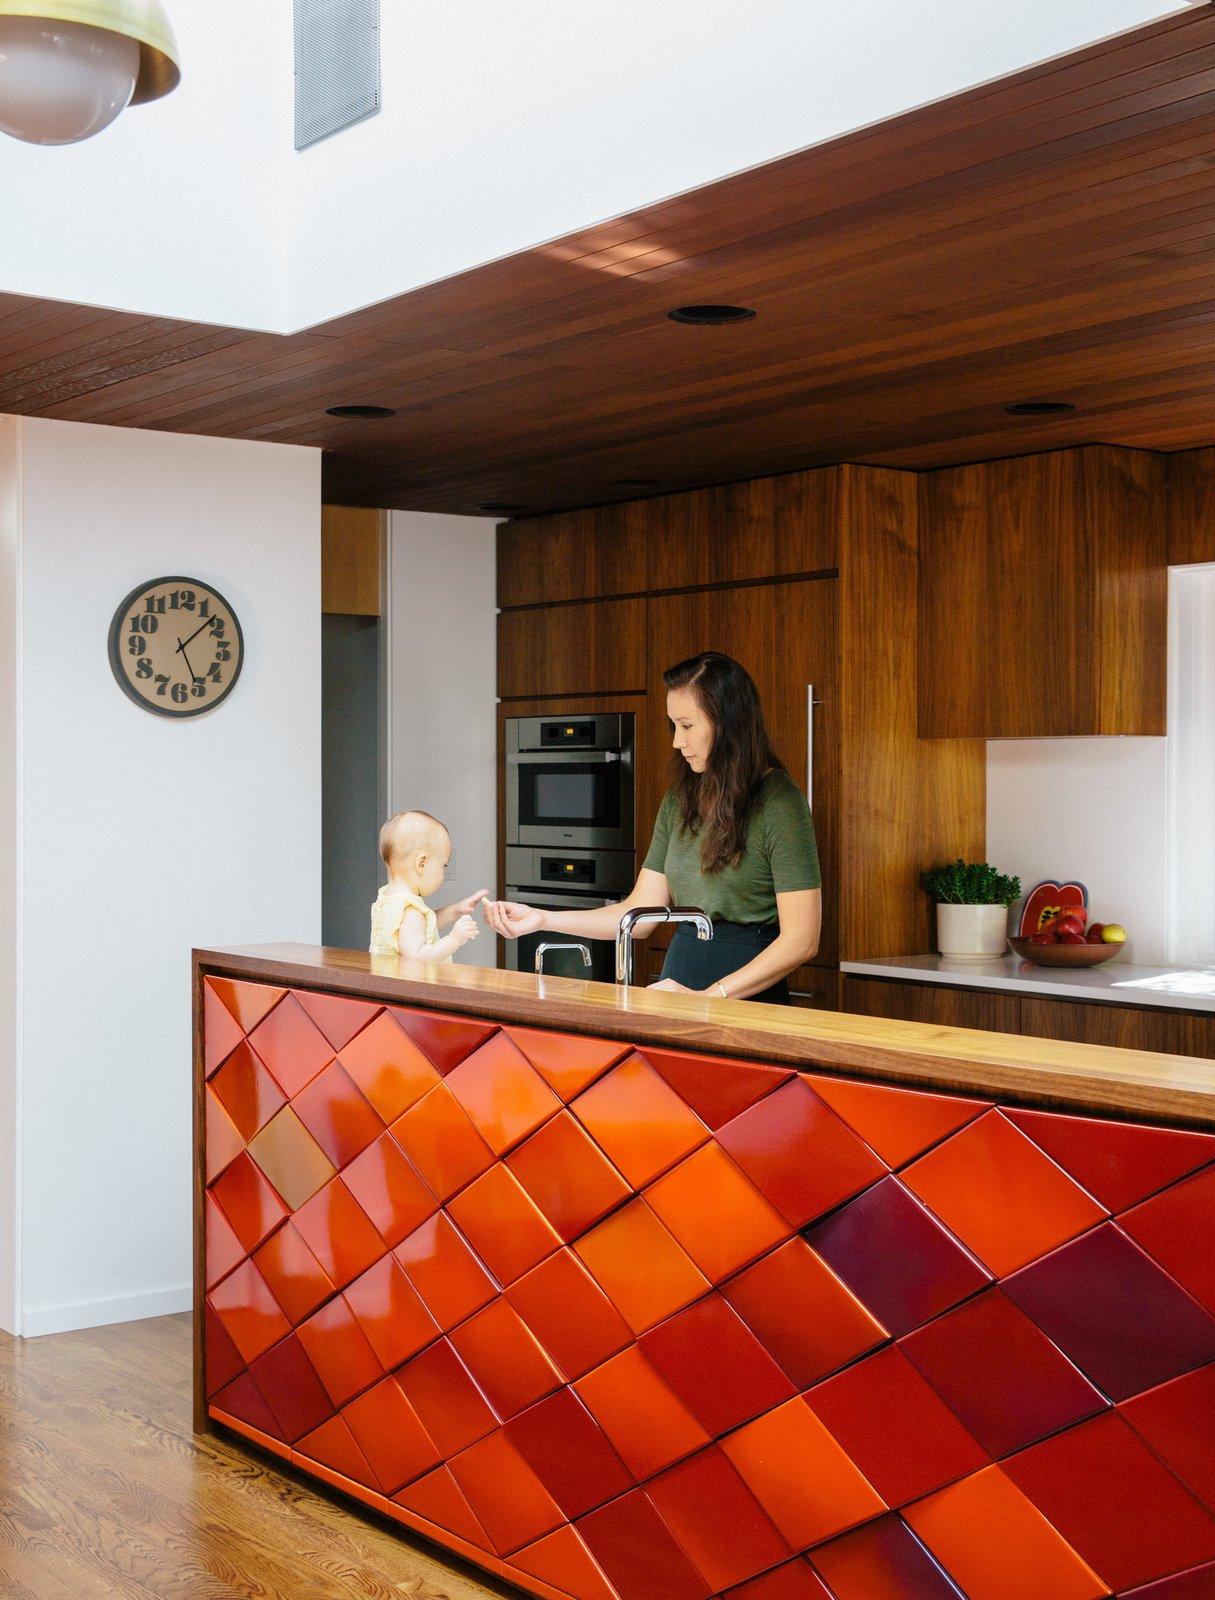 #color #interior #kitchen #island #red #tiles #Portland #Oregon #DaleFarr #JessicaHelgersonInteriorDesign  36+ Interior Color Pop Ideas For Modern Homes by Dwell